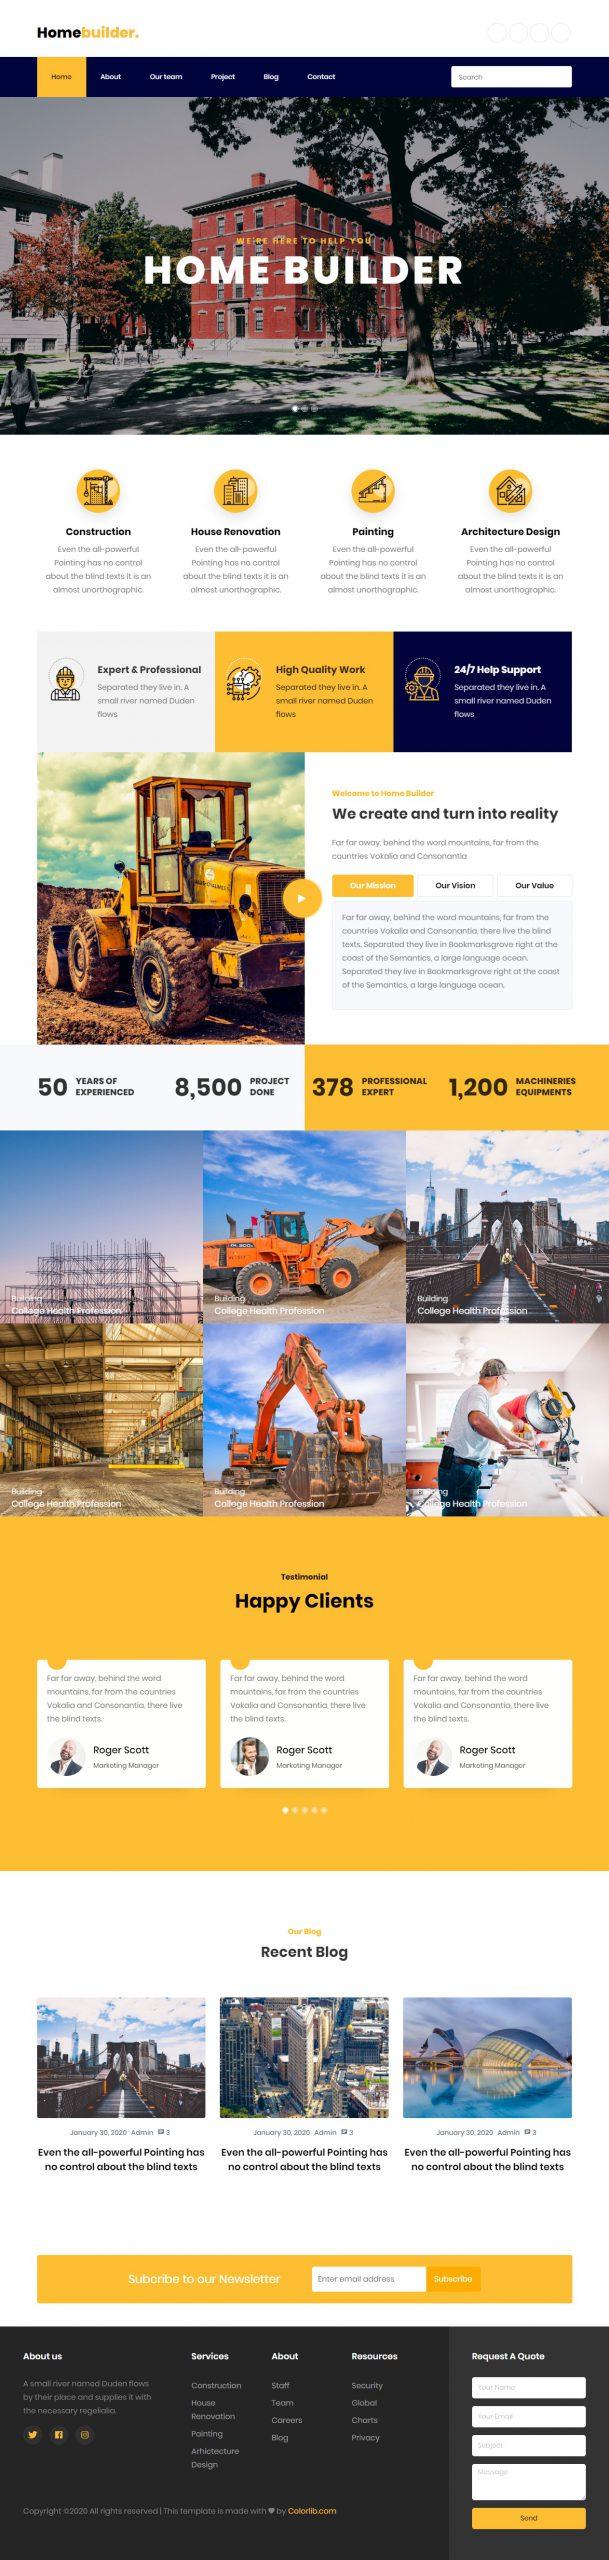 Mẫu website Công ty xây dựng Home Builder